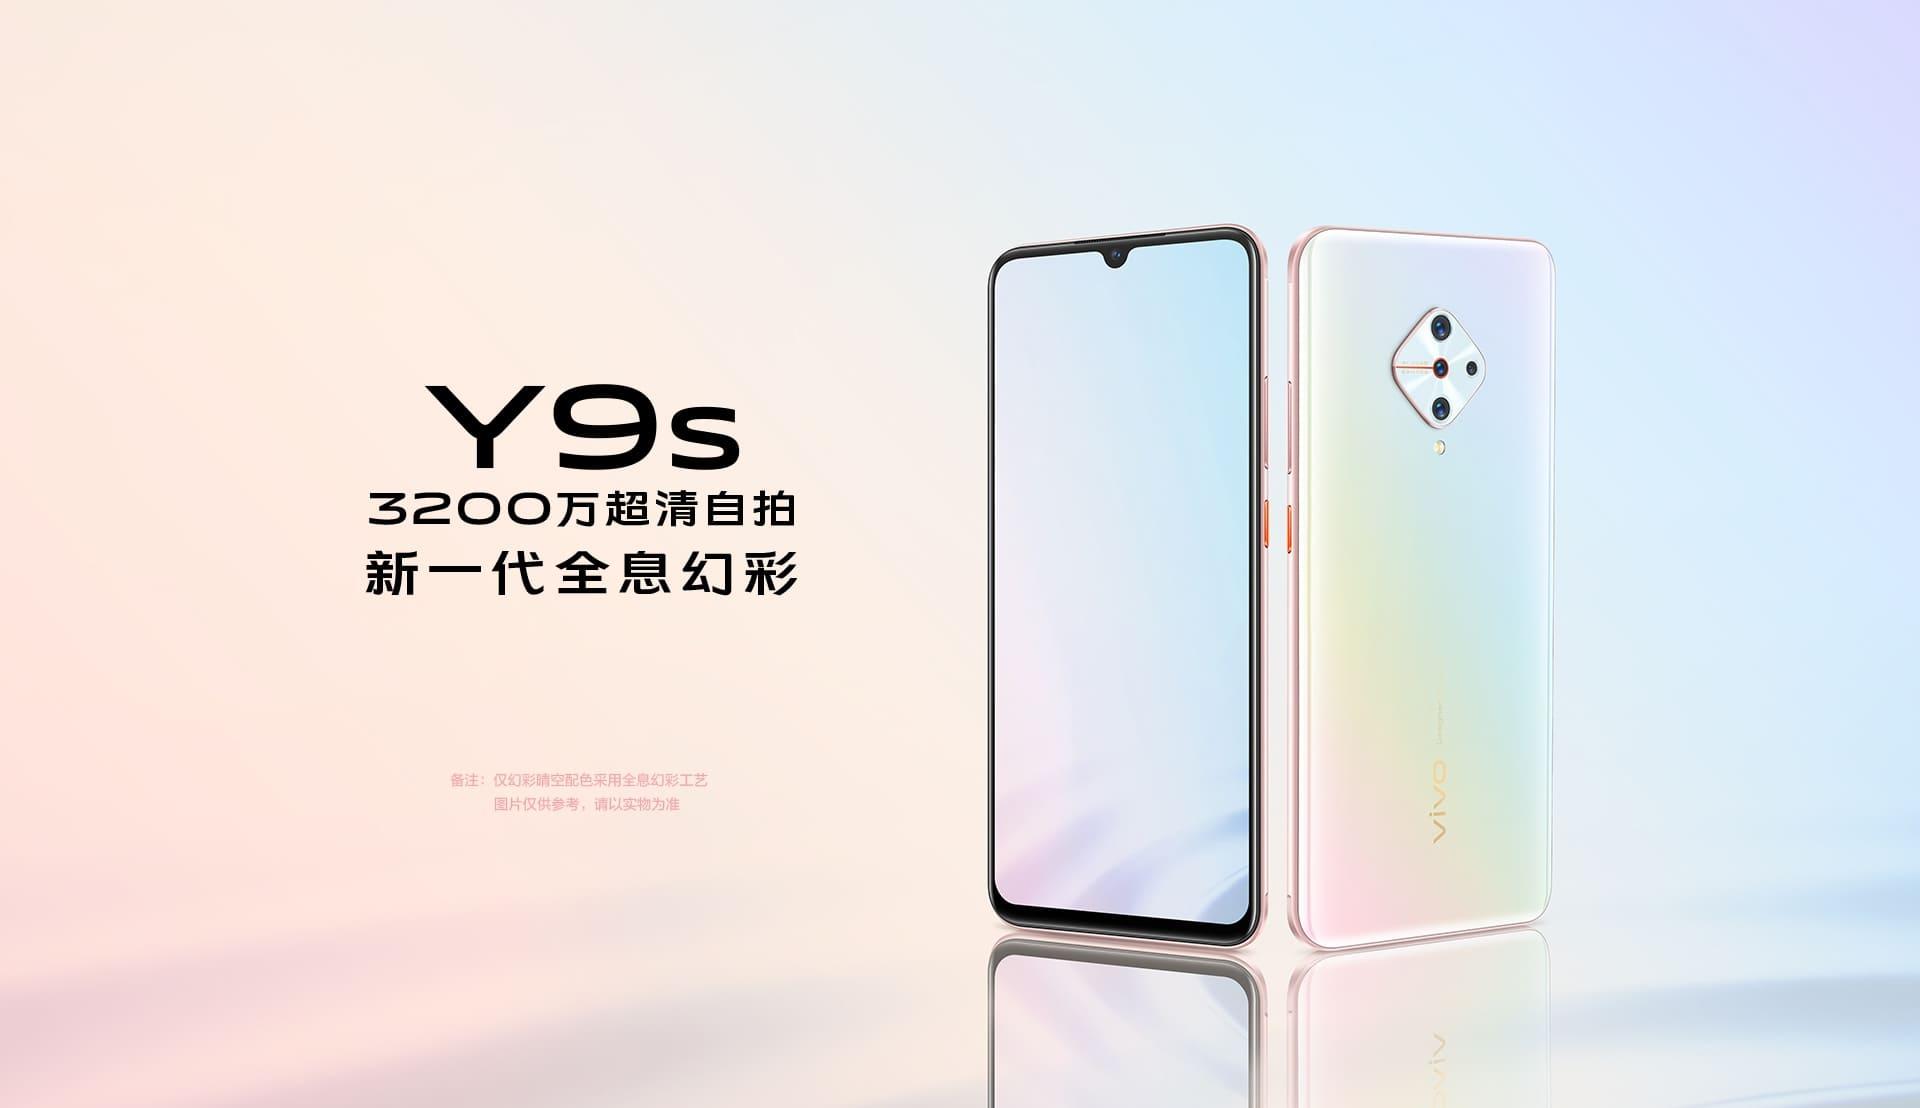 Представлен Vivo Y9s с 4-камерами и мощной селфи-камерой